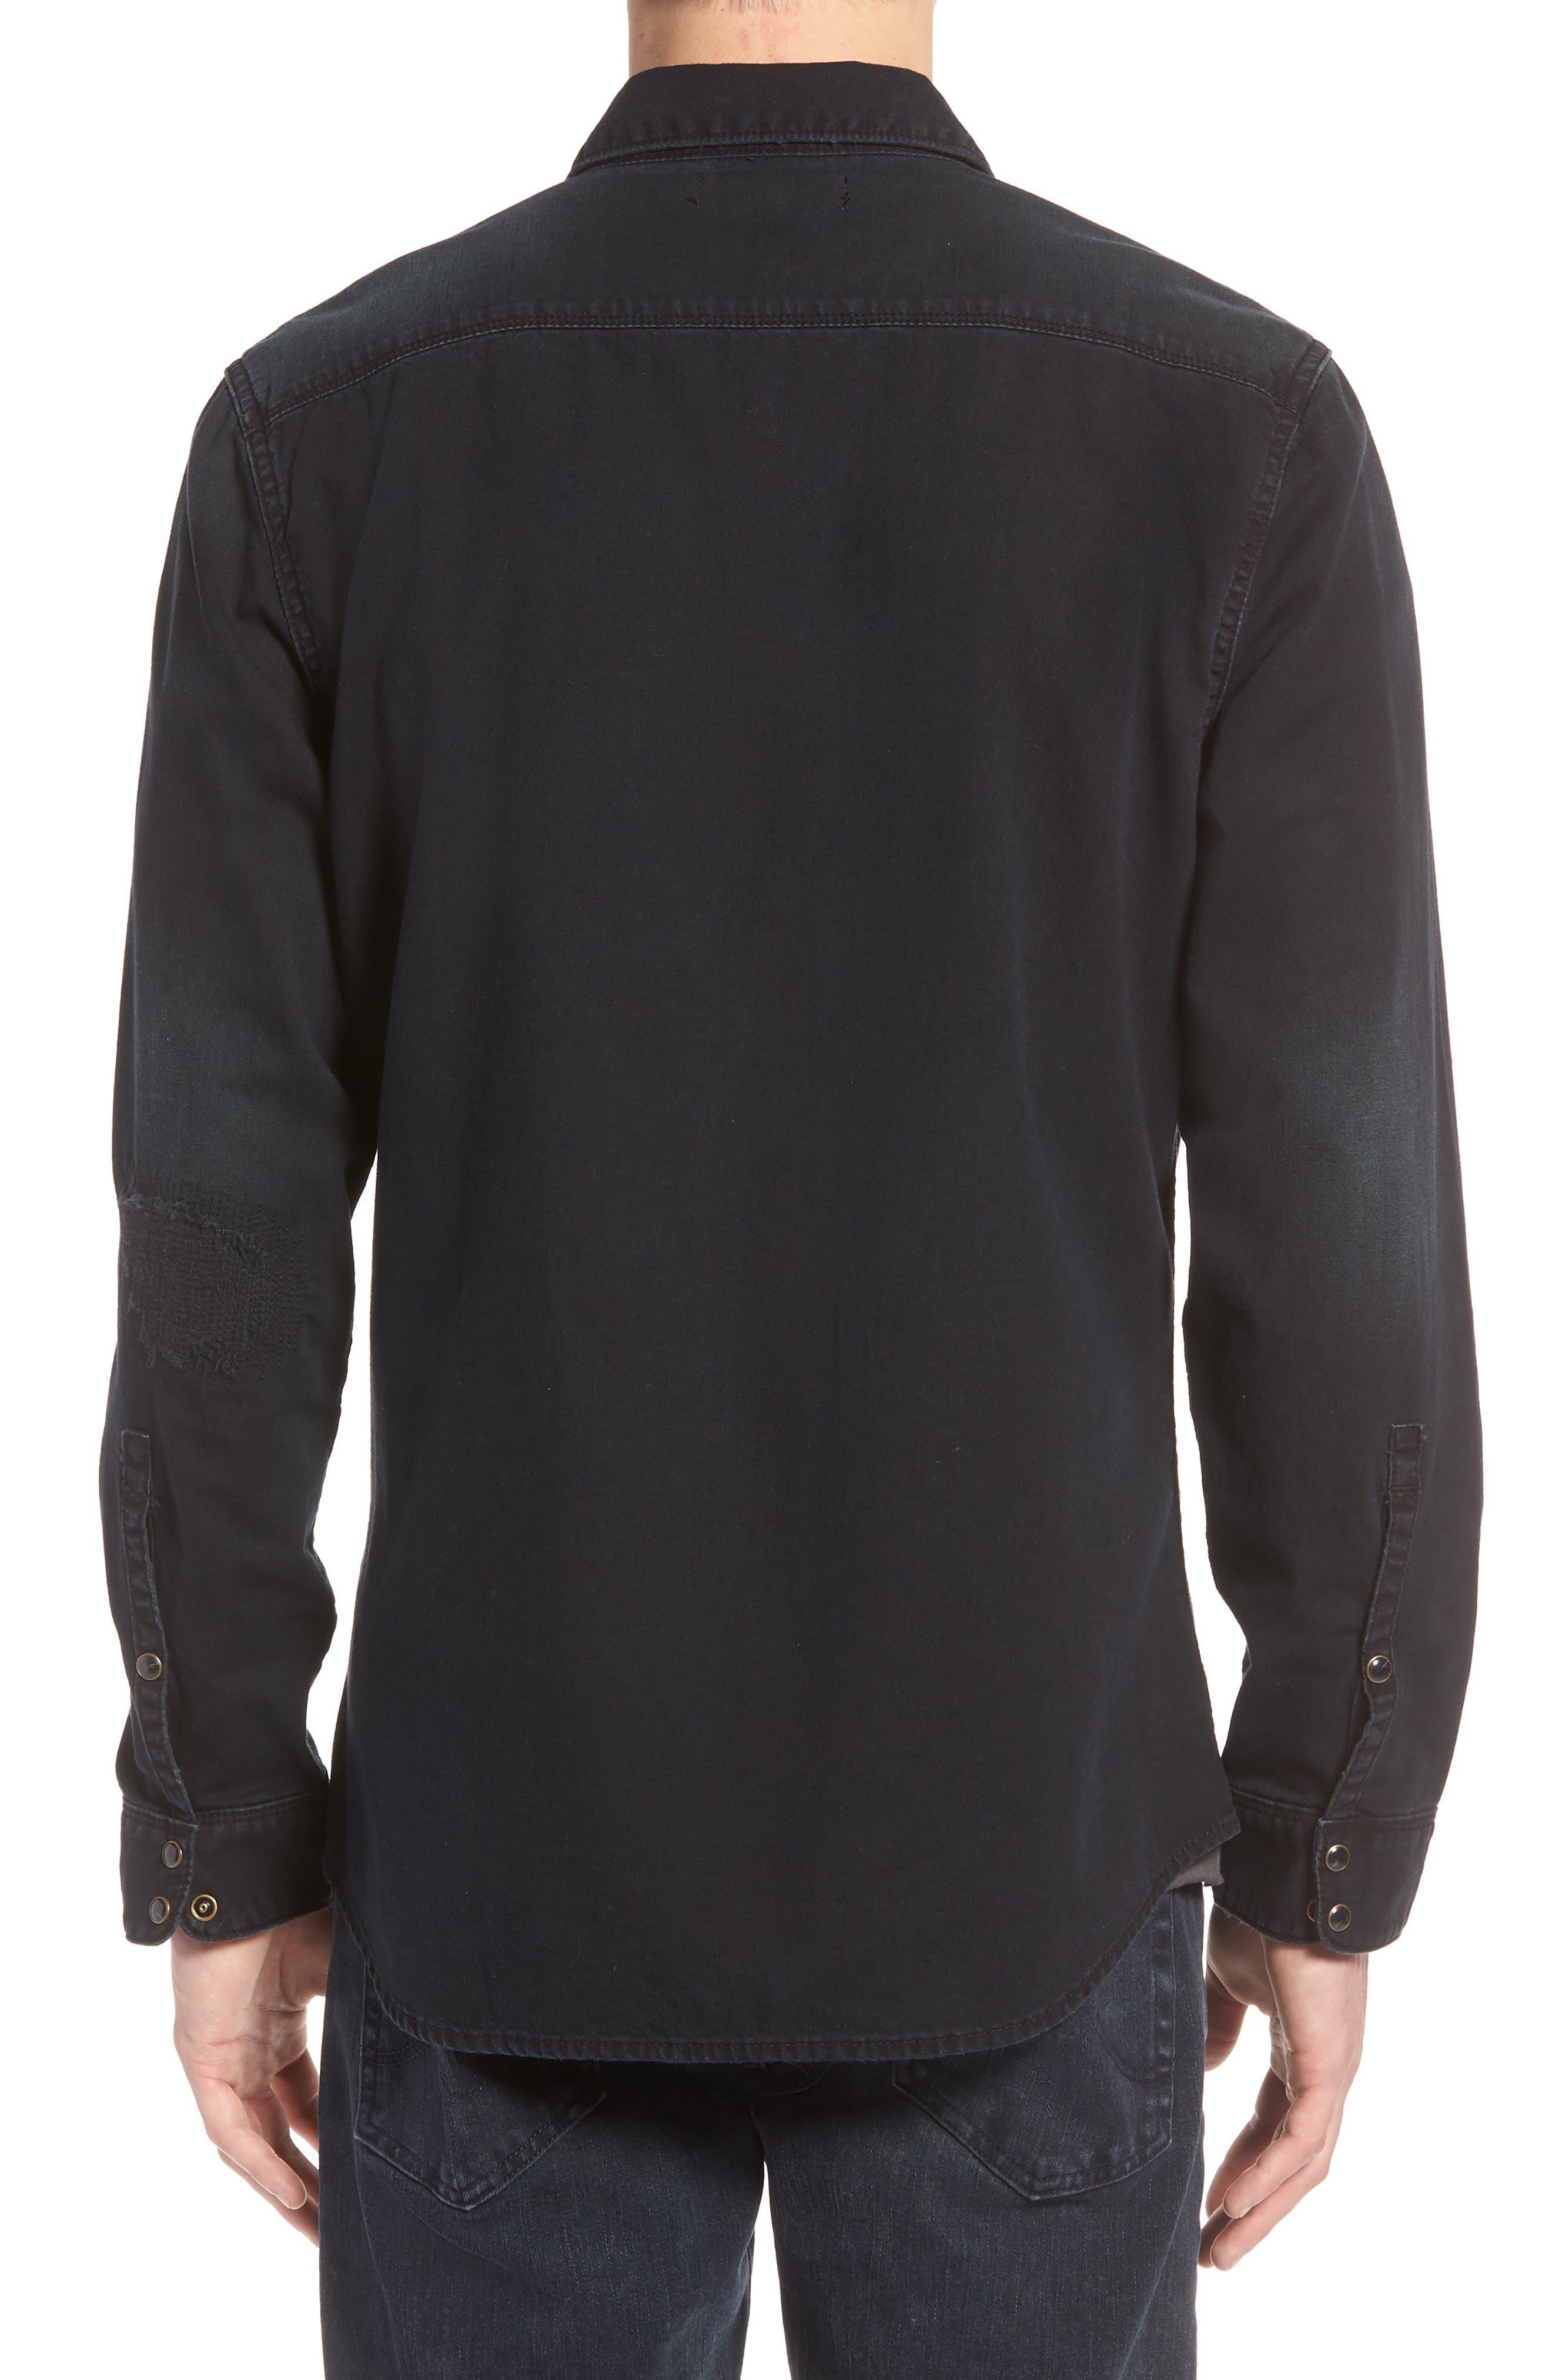 TREASURE & BOND,                             Western Denim Sport Shirt,                             Alternate thumbnail 2, color,                             002